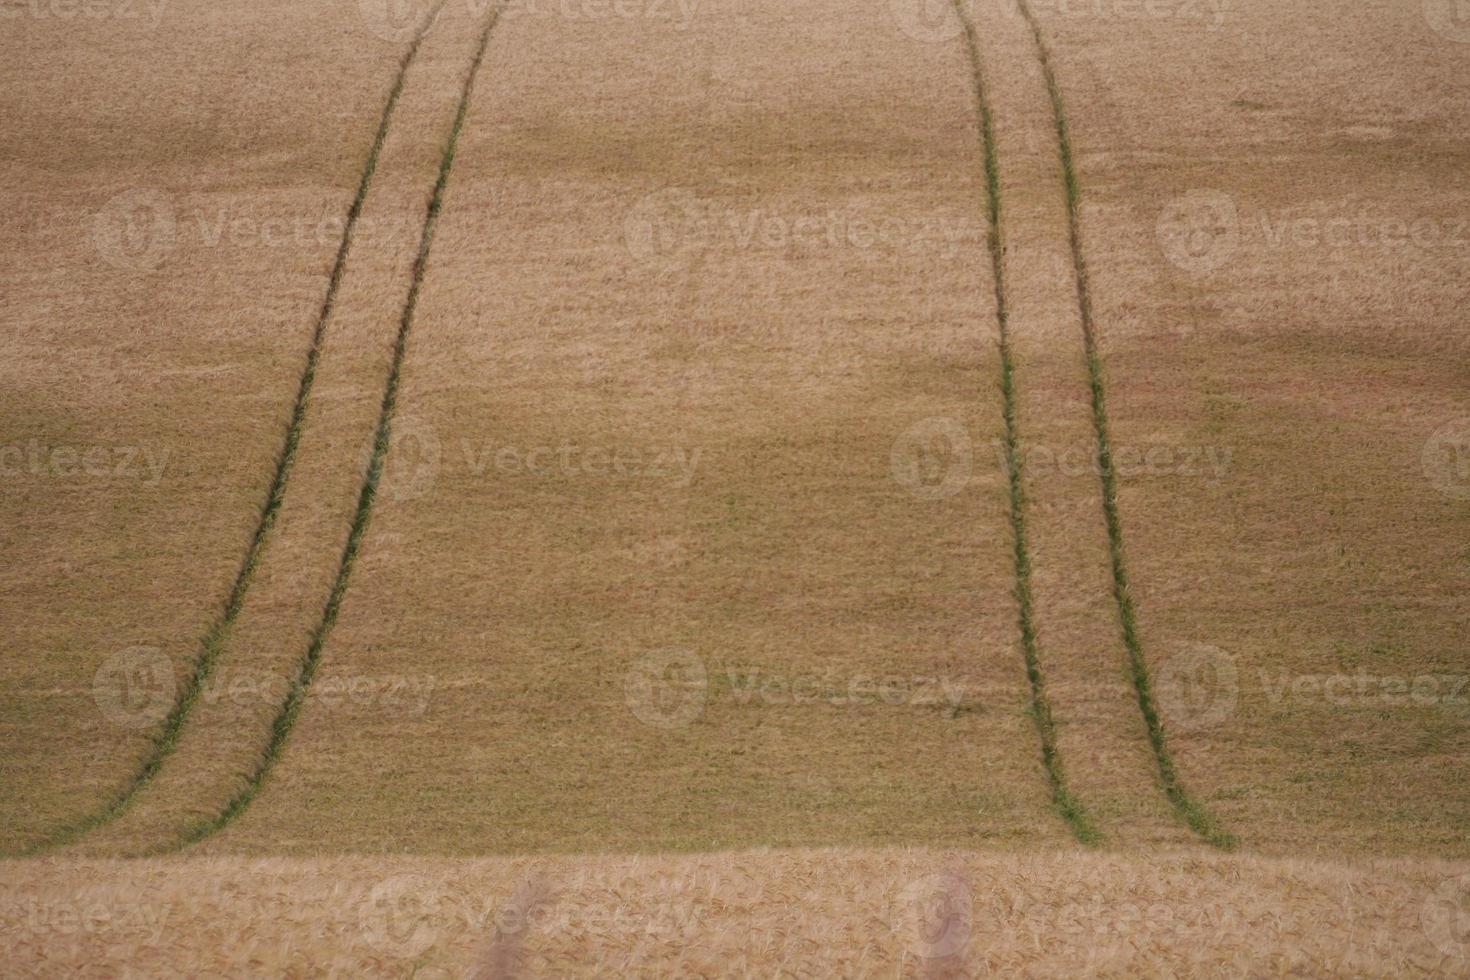 tarweveld tracks foto